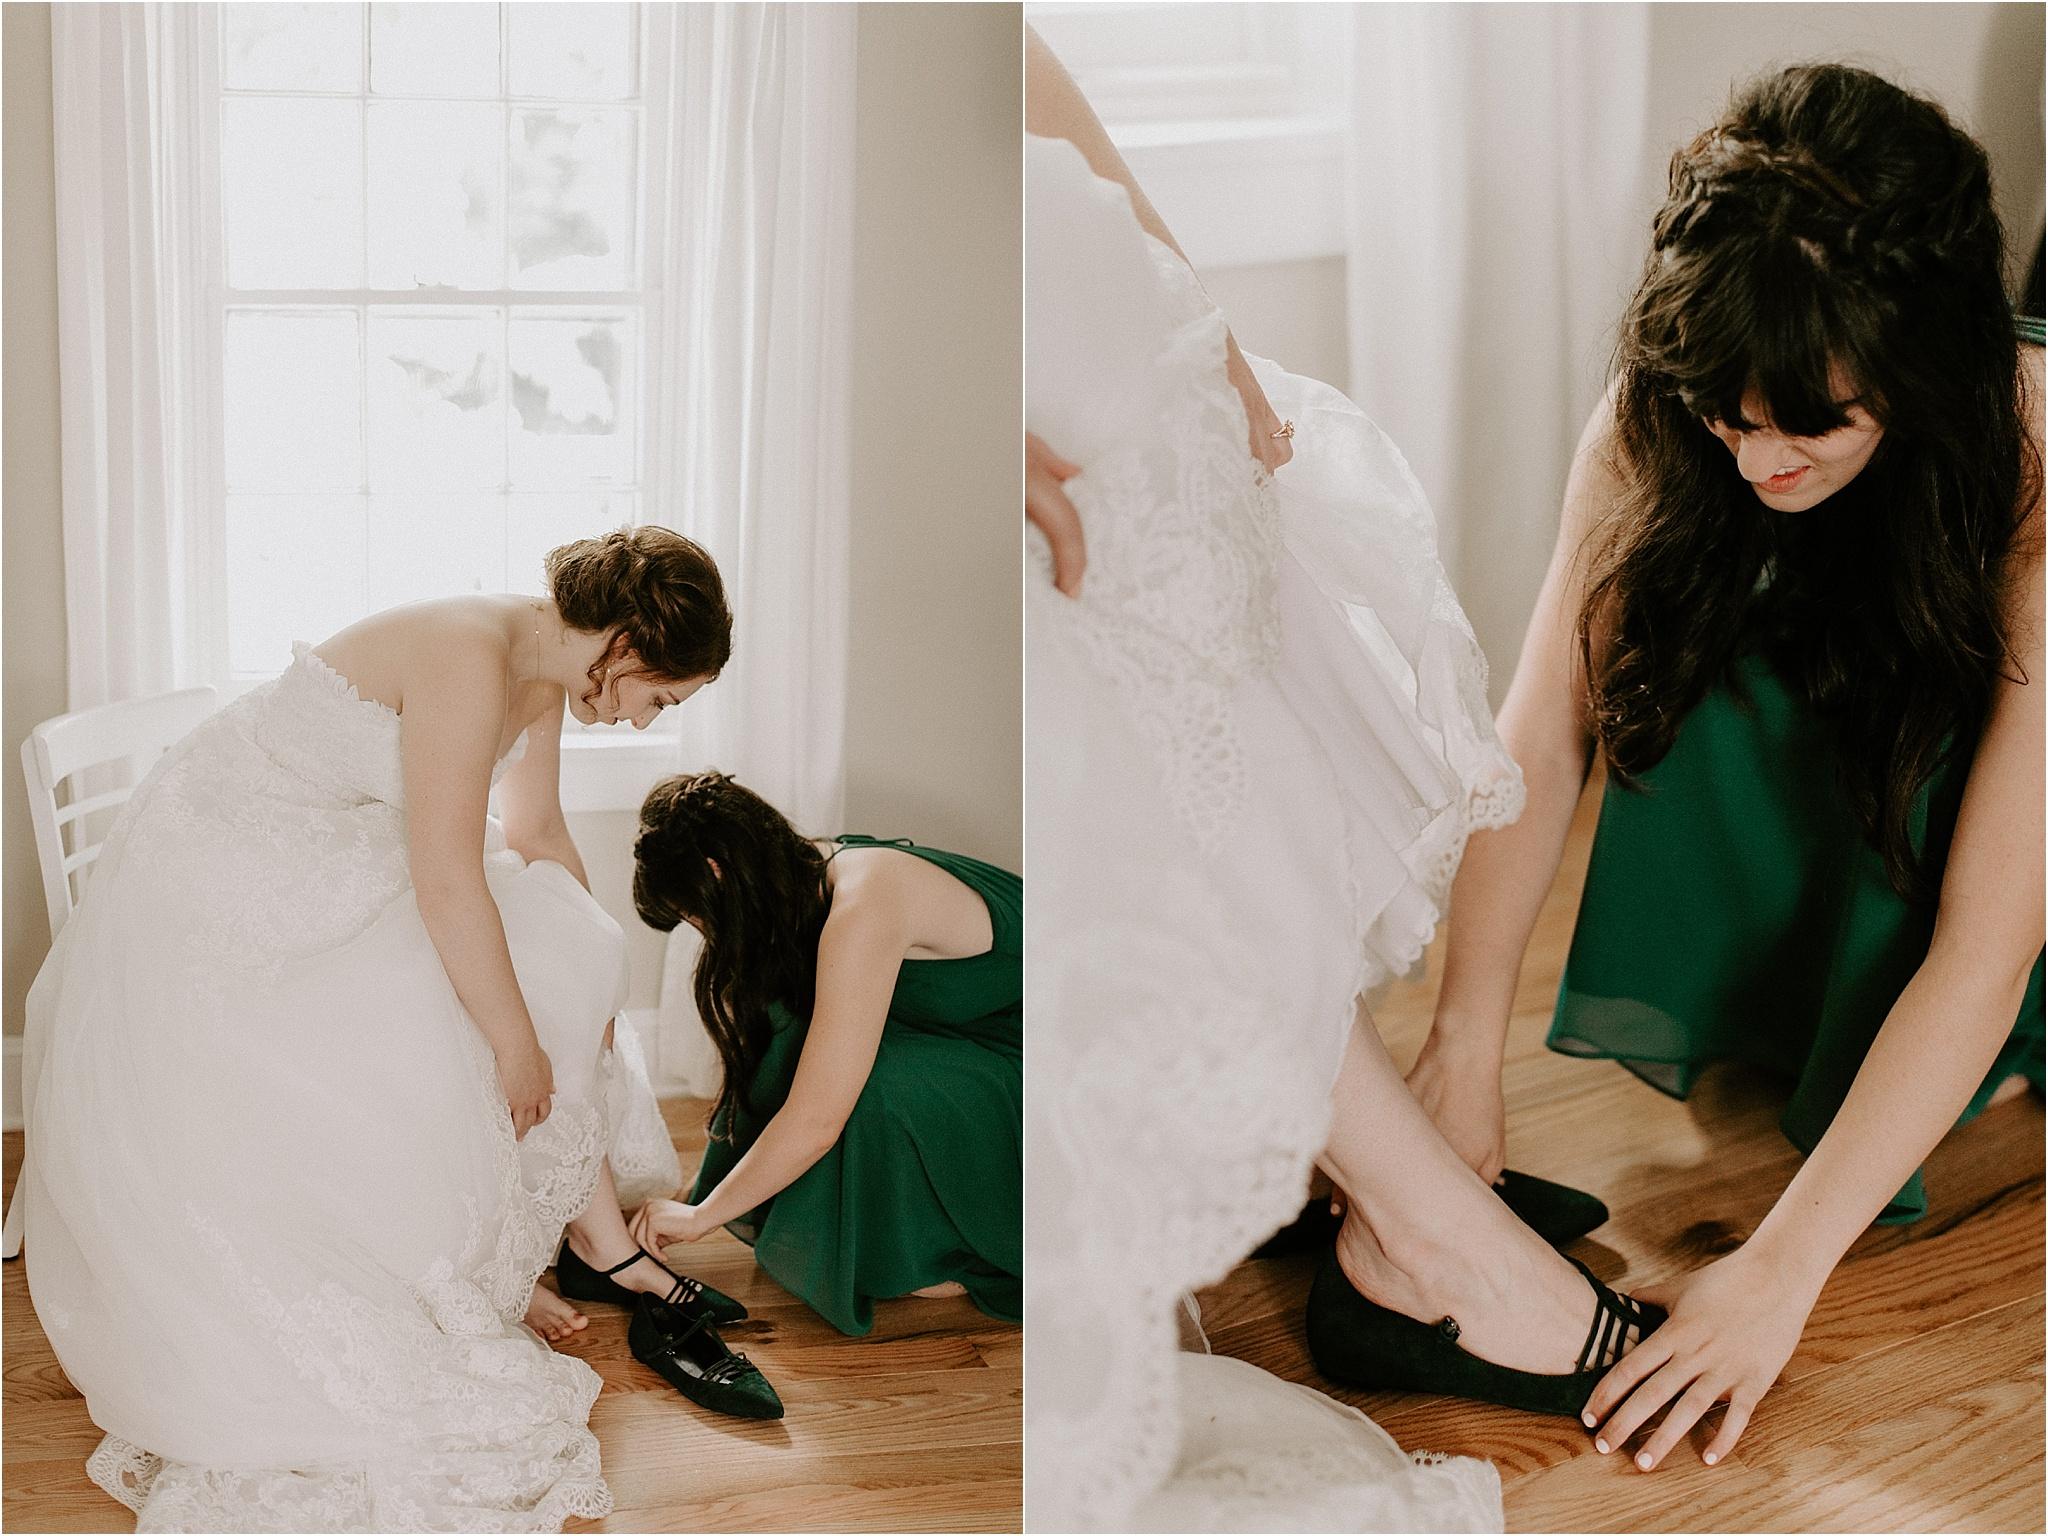 Sarah_Brookhart_Lancaster_Wedding_Photographer_0009.jpg